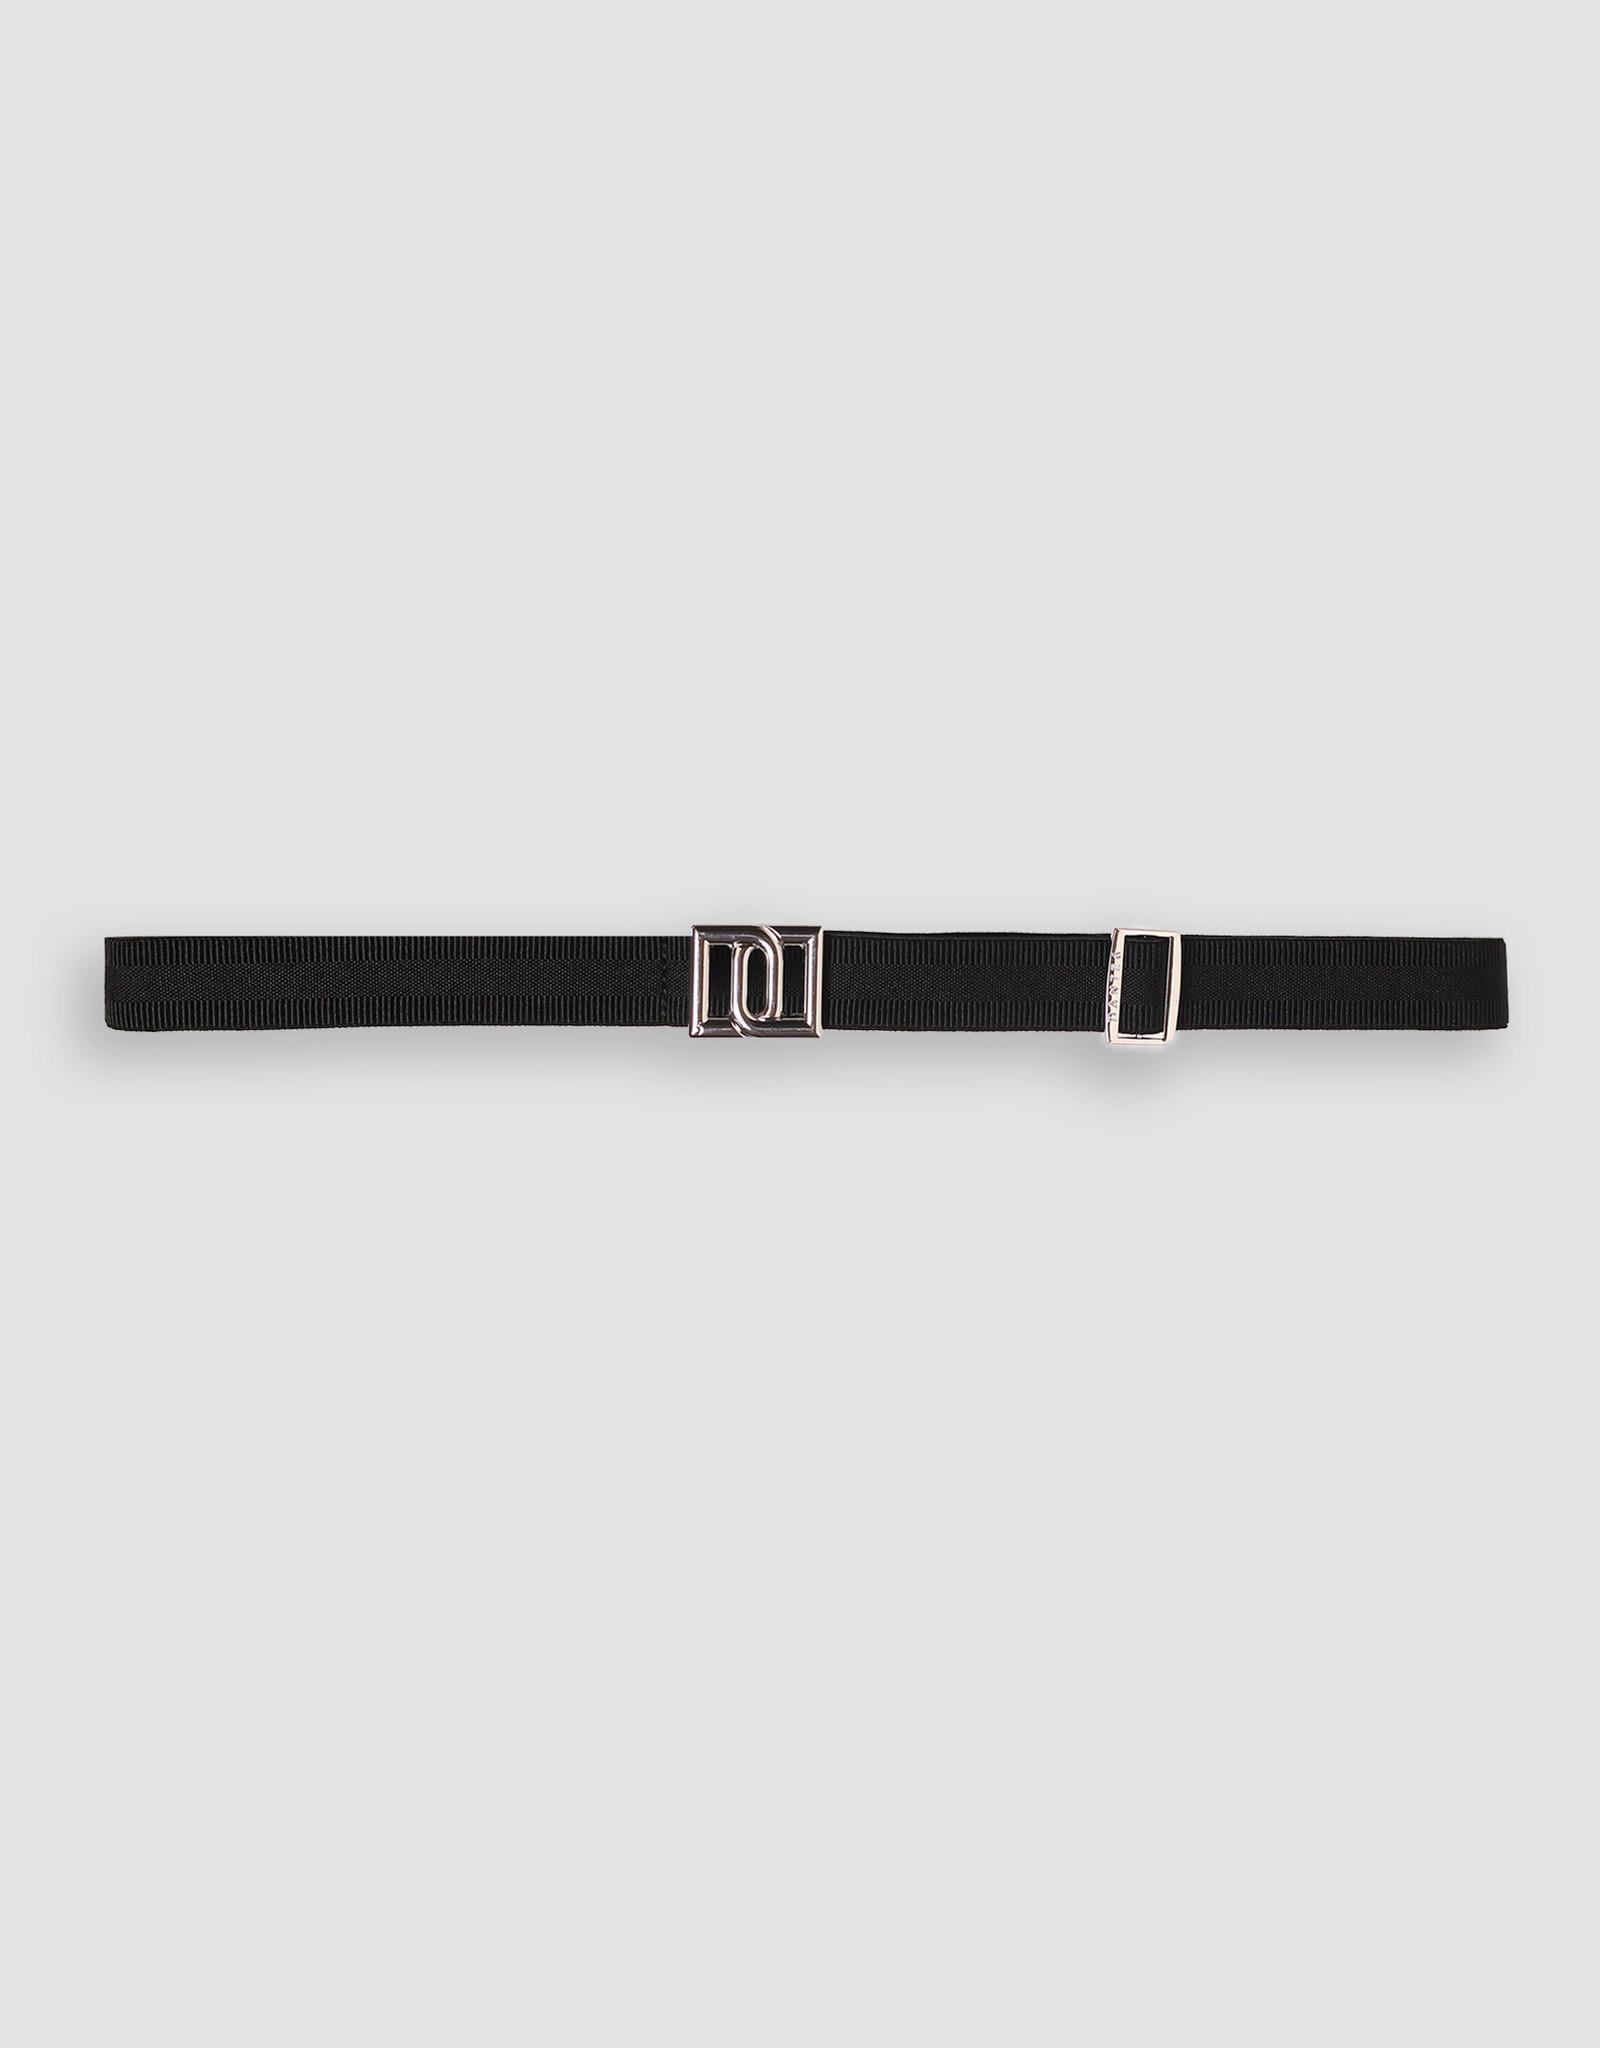 Dante 6 Monogram Petite Stripe Belt Raven Silver